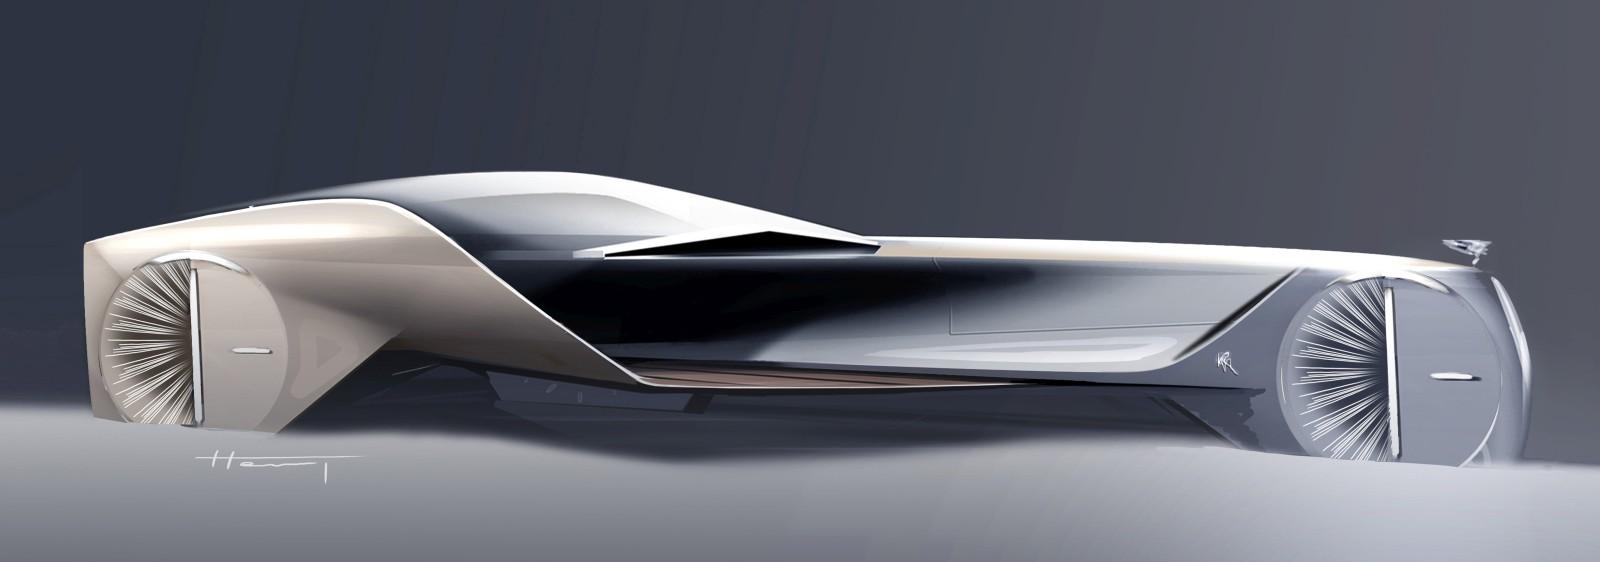 Rolls-Royce VISION NEXT 100 (28)